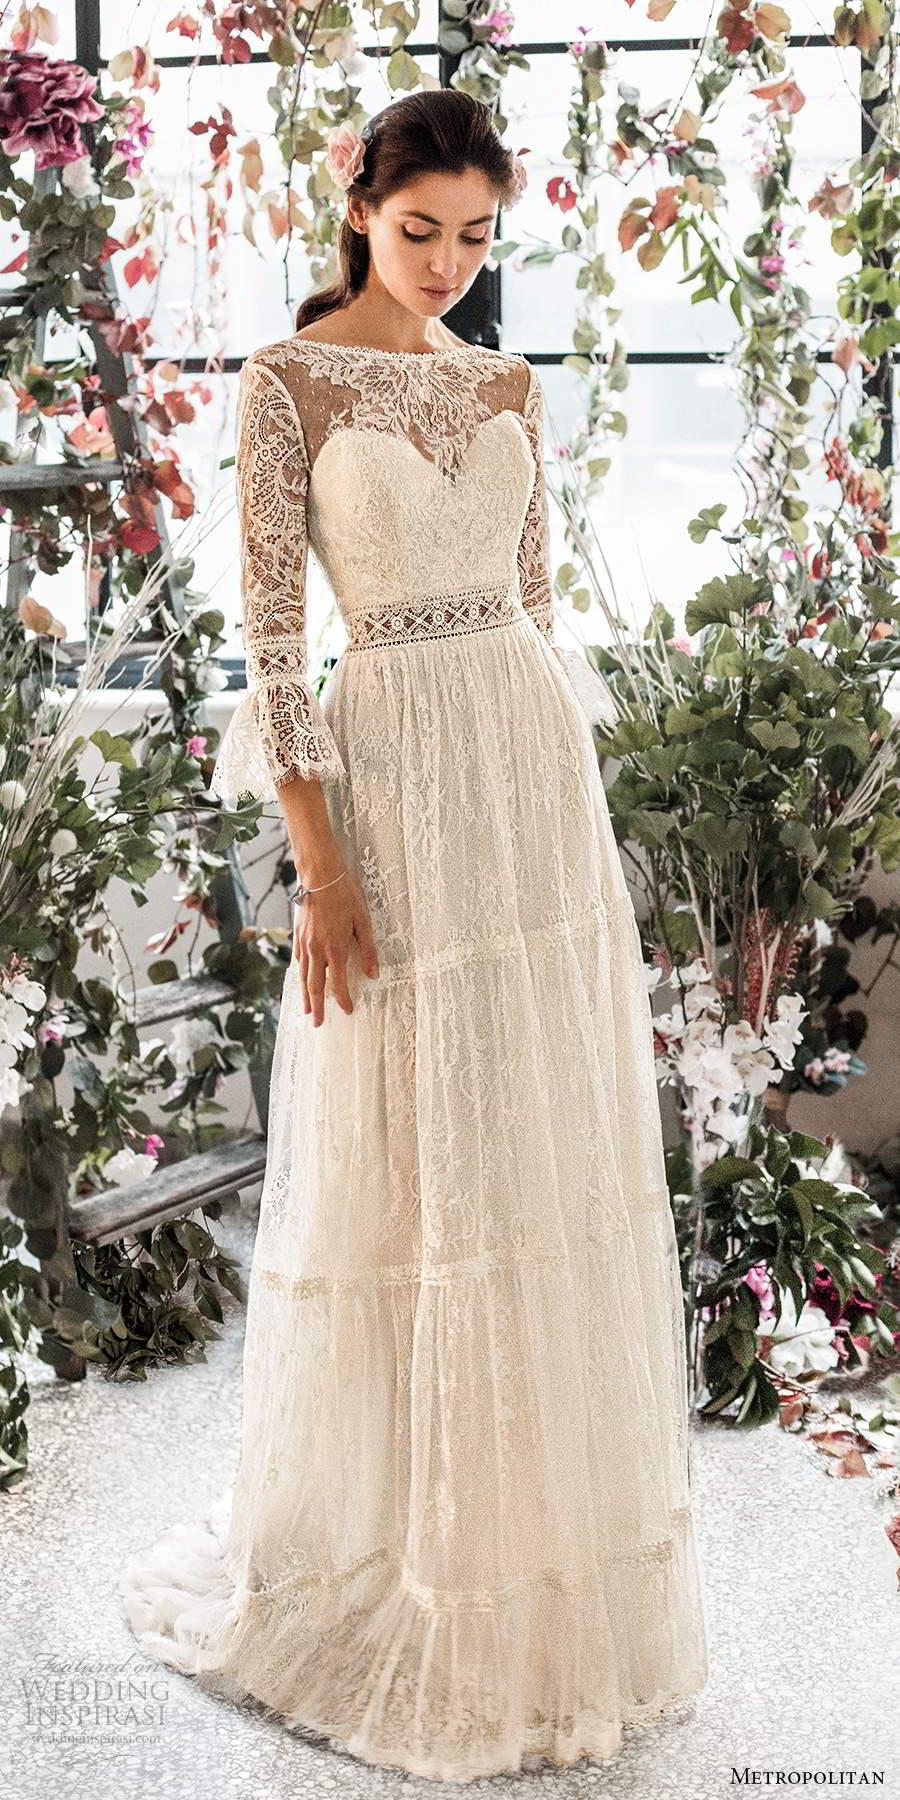 metropolitan spring 2020 bridal 3 quarter bell sleeves illusion bateau neck sweetheart neckline fully embellished lace a line boho chic wedding dress open back sweep train (8) mv